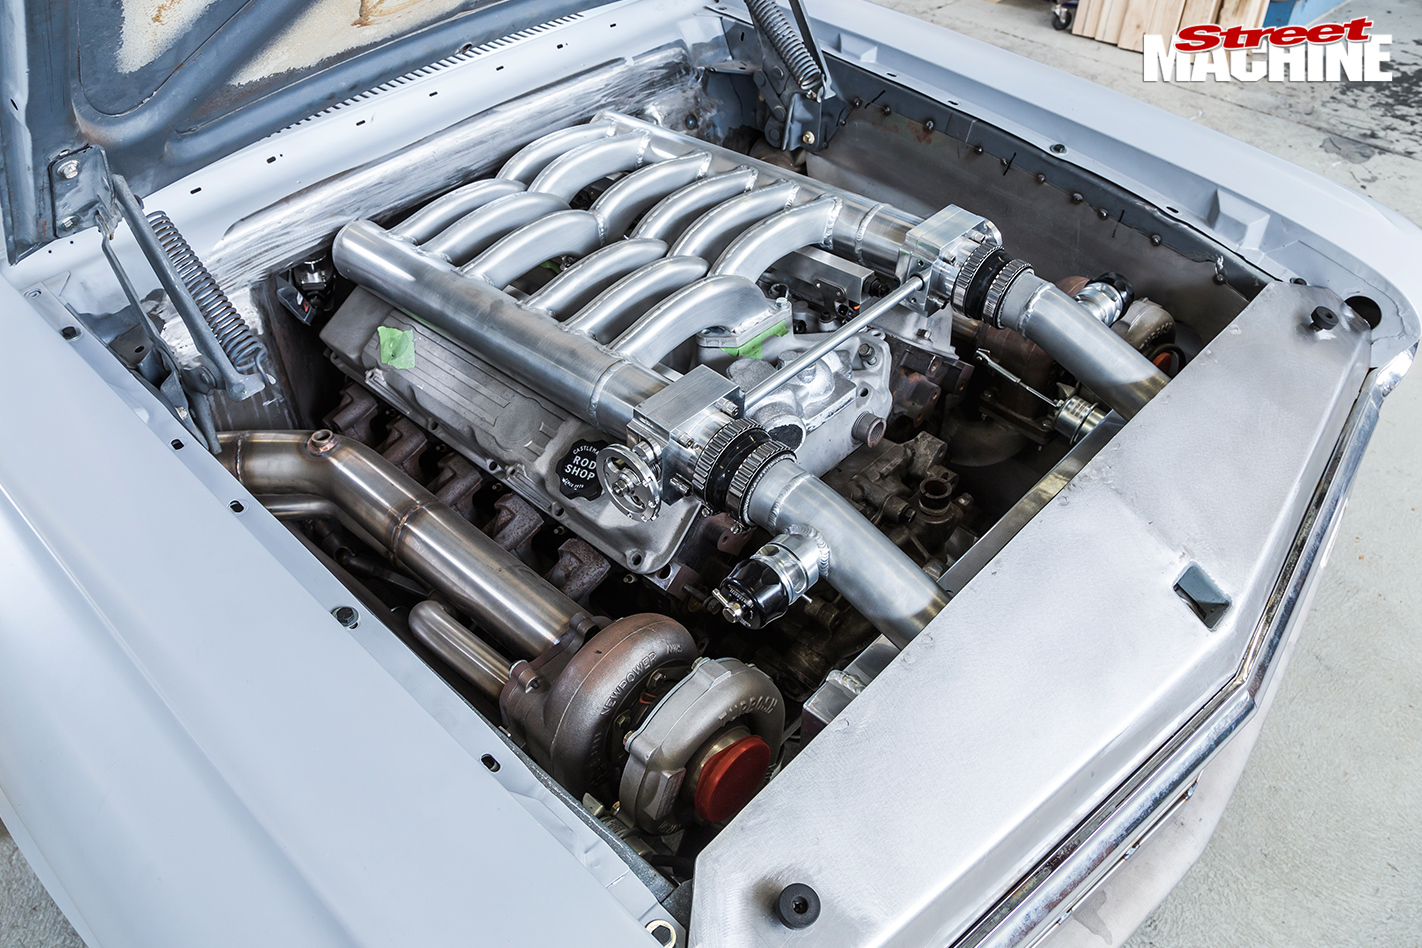 Castlemaine -rod -shop -engine